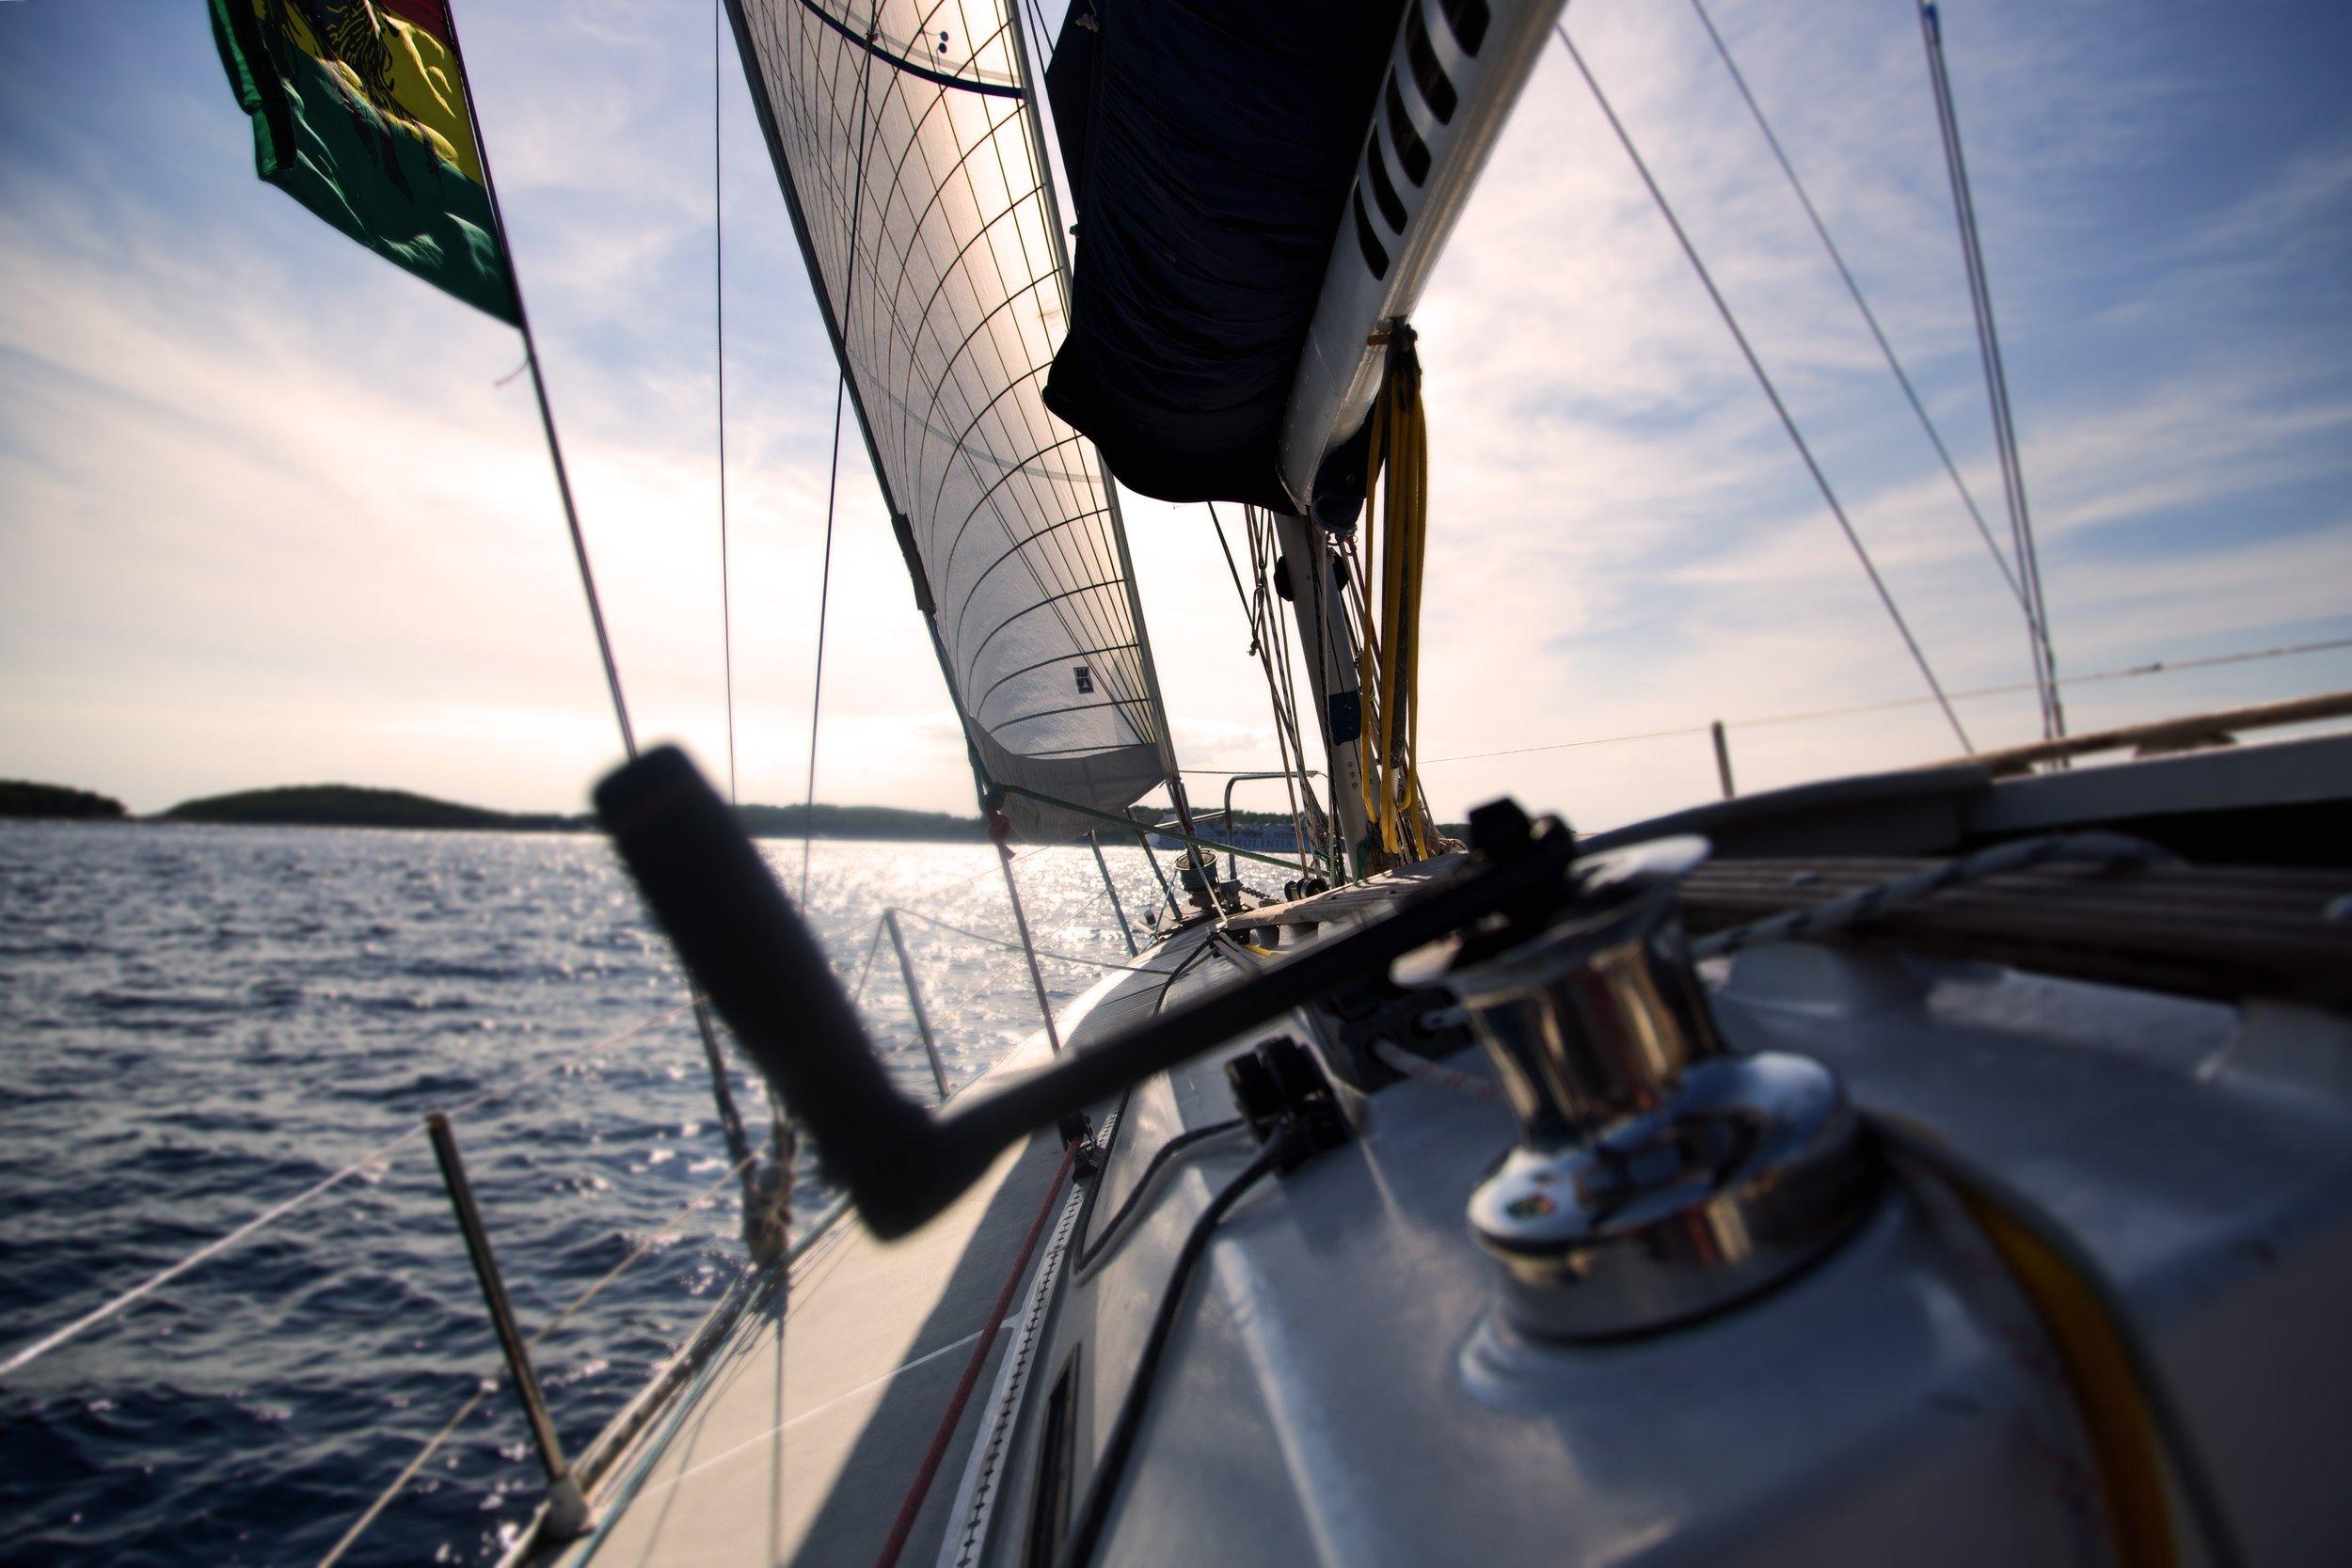 yacht under sail - starboard tack